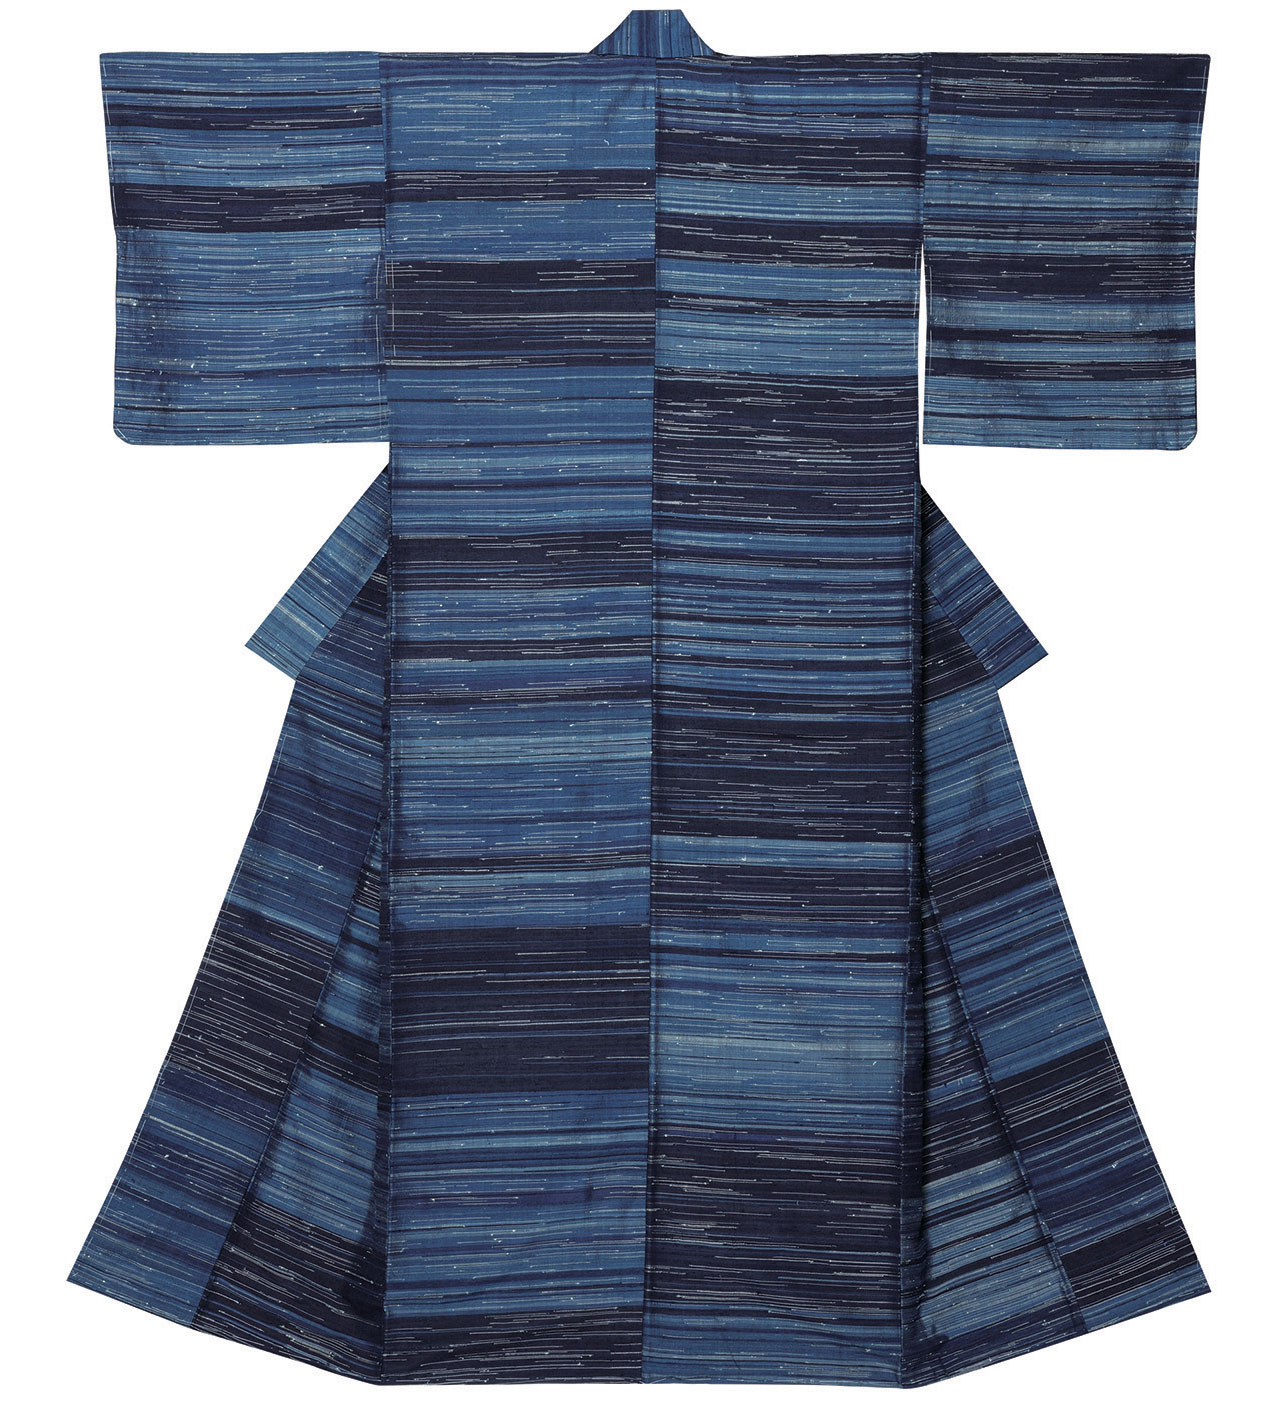 "Tsumugi silk kimono ""Autumn Mist"" by Shimura Fukumu 1961. Silk, pongee type weaving.Photo by Shikata Kunihiro. Van Cleef & Arpels Van Cleef & Arpels High Jewelry and Japanese Crafts in Kyoto's Museum 9k mastery of an art van cleef arpels kyoto japan yatzer"